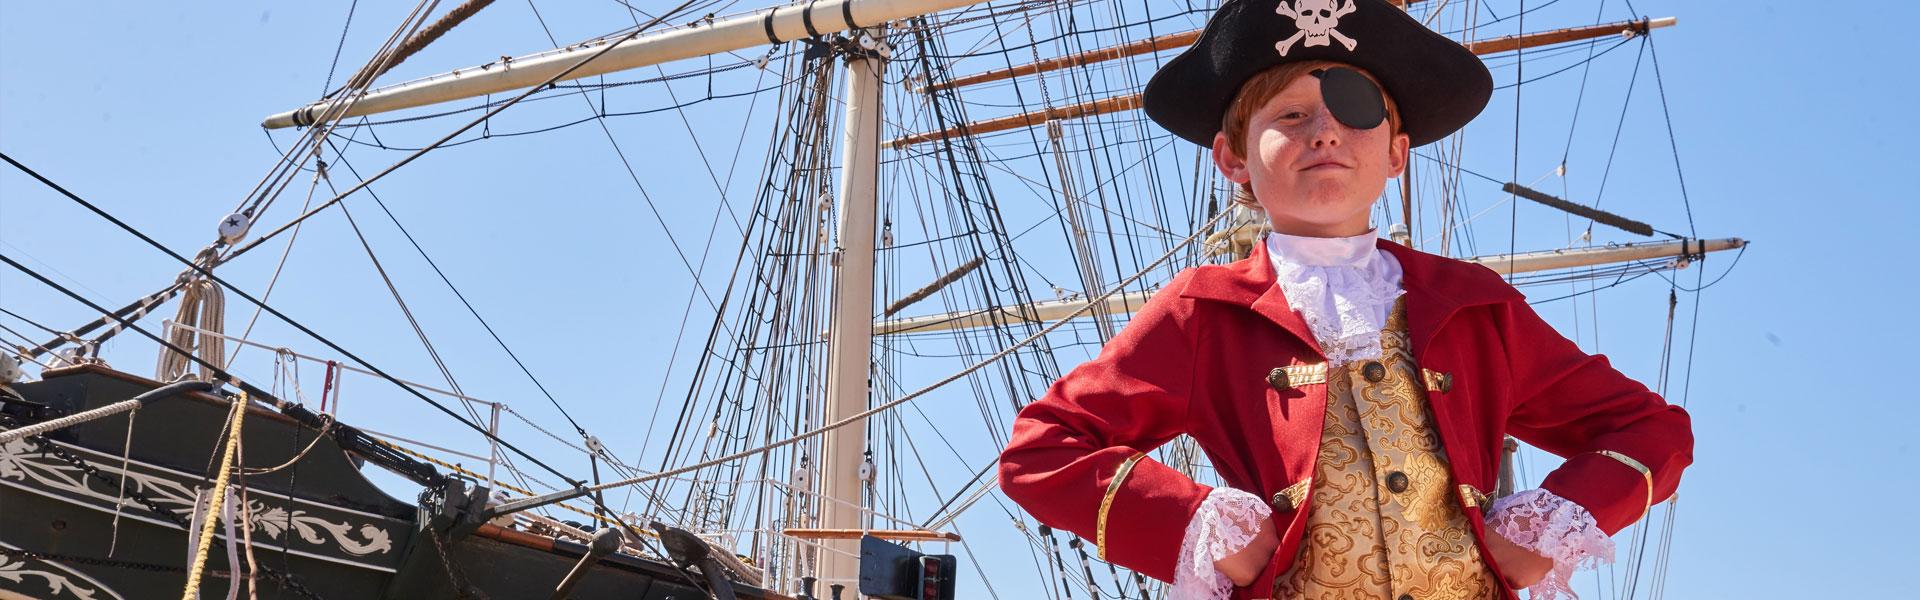 Boy Standing in Front of Tall Ship ELISSA, Galveston, TX